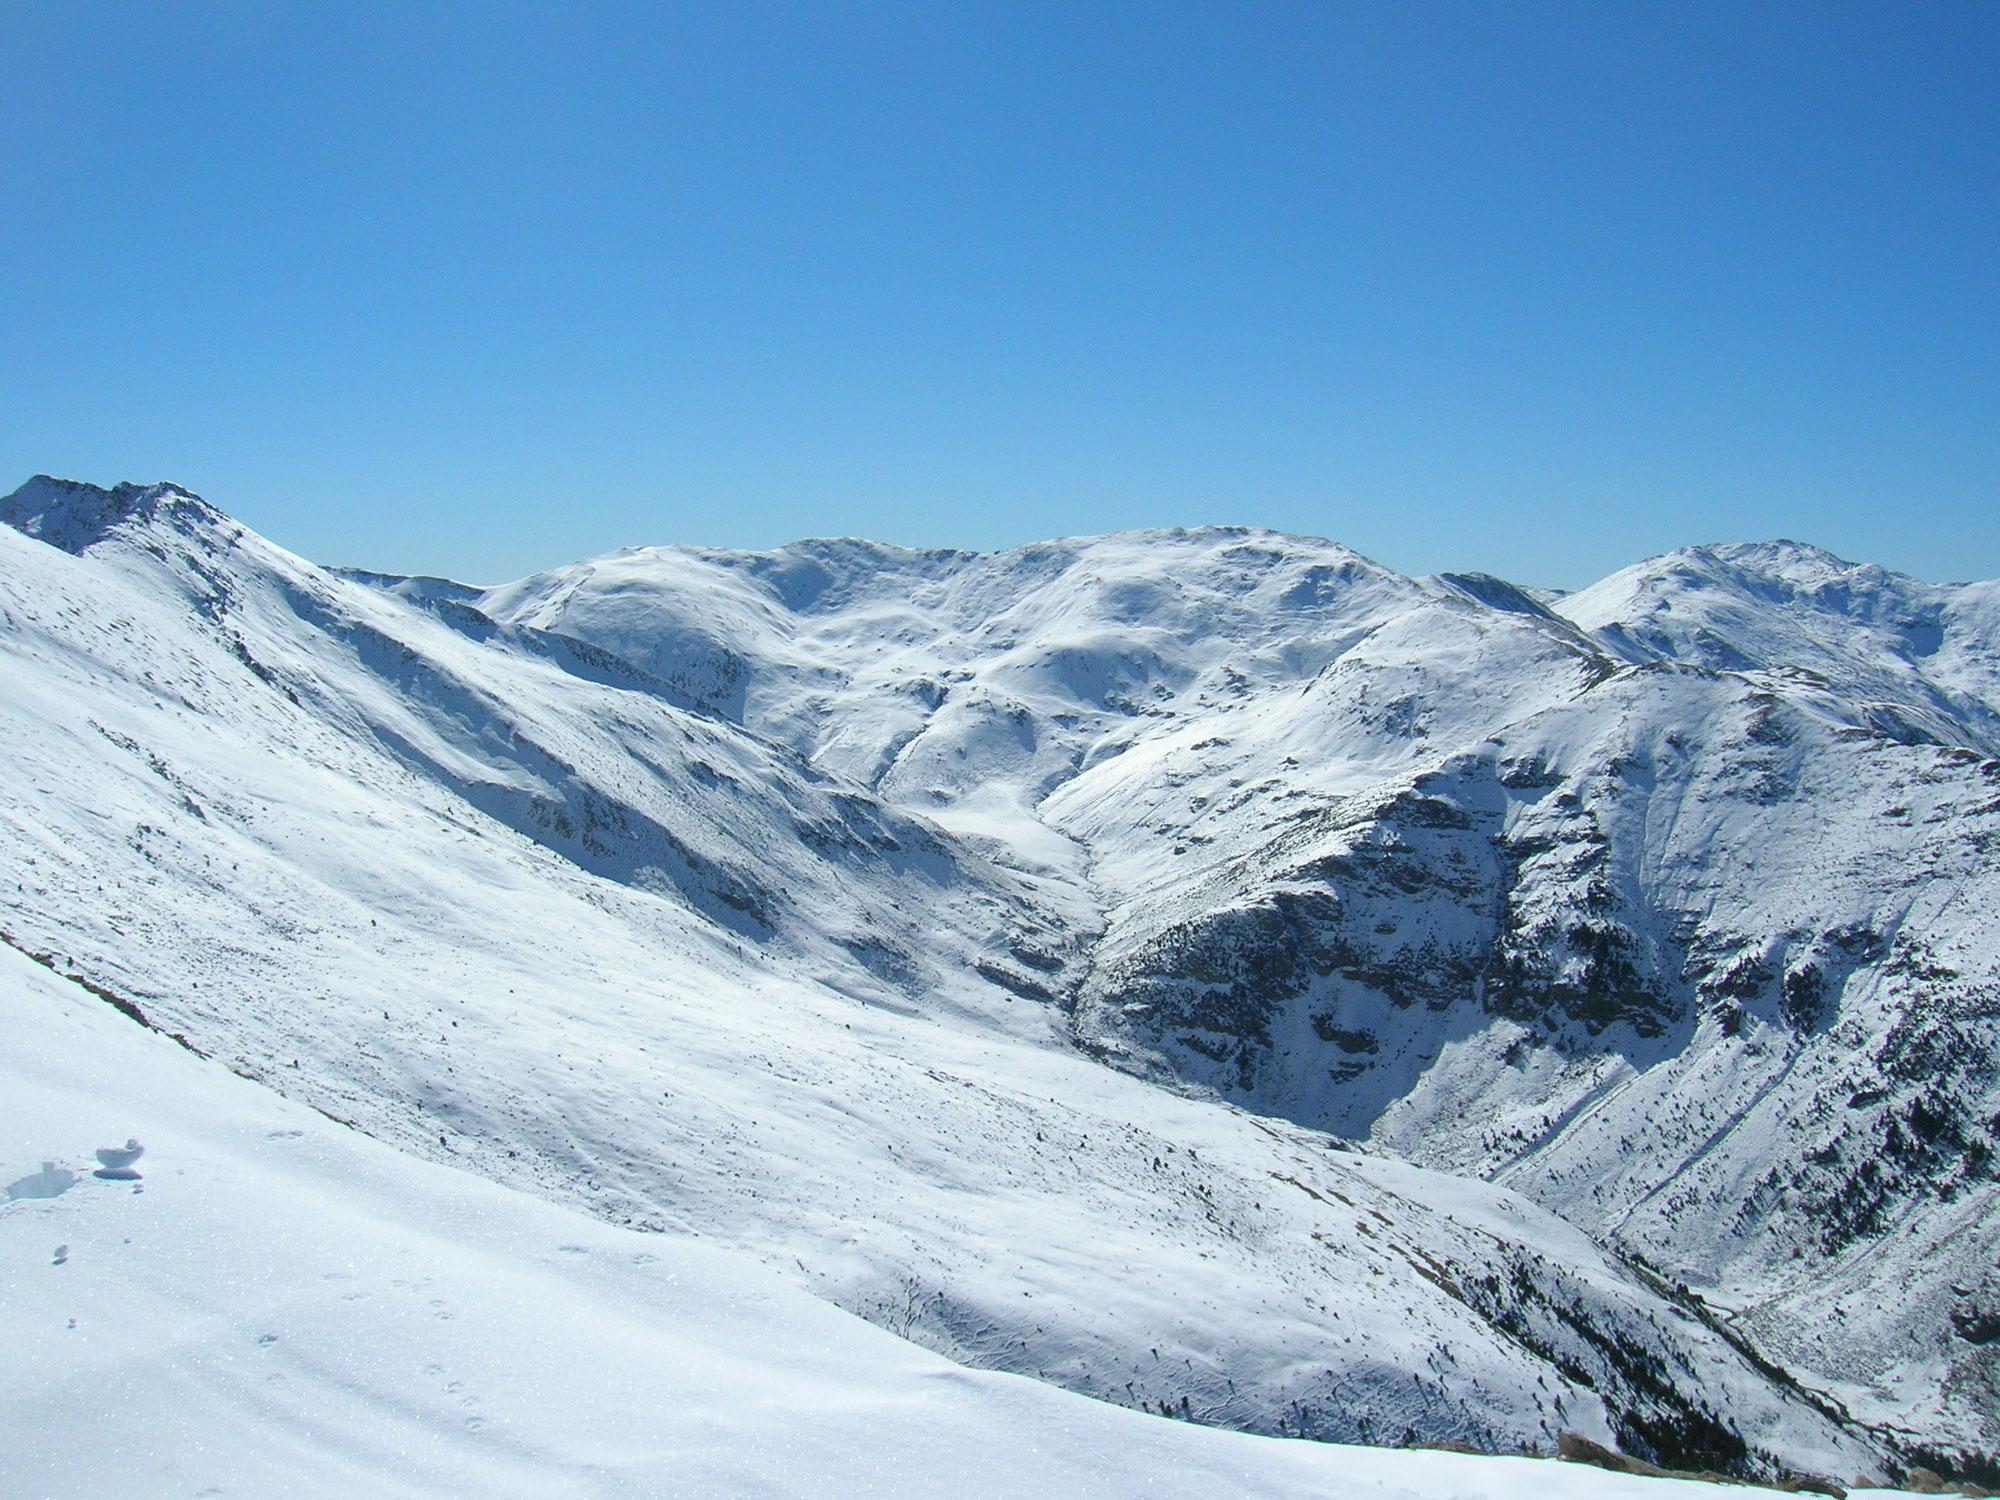 La Quillane, la plus innovante des stations de ski